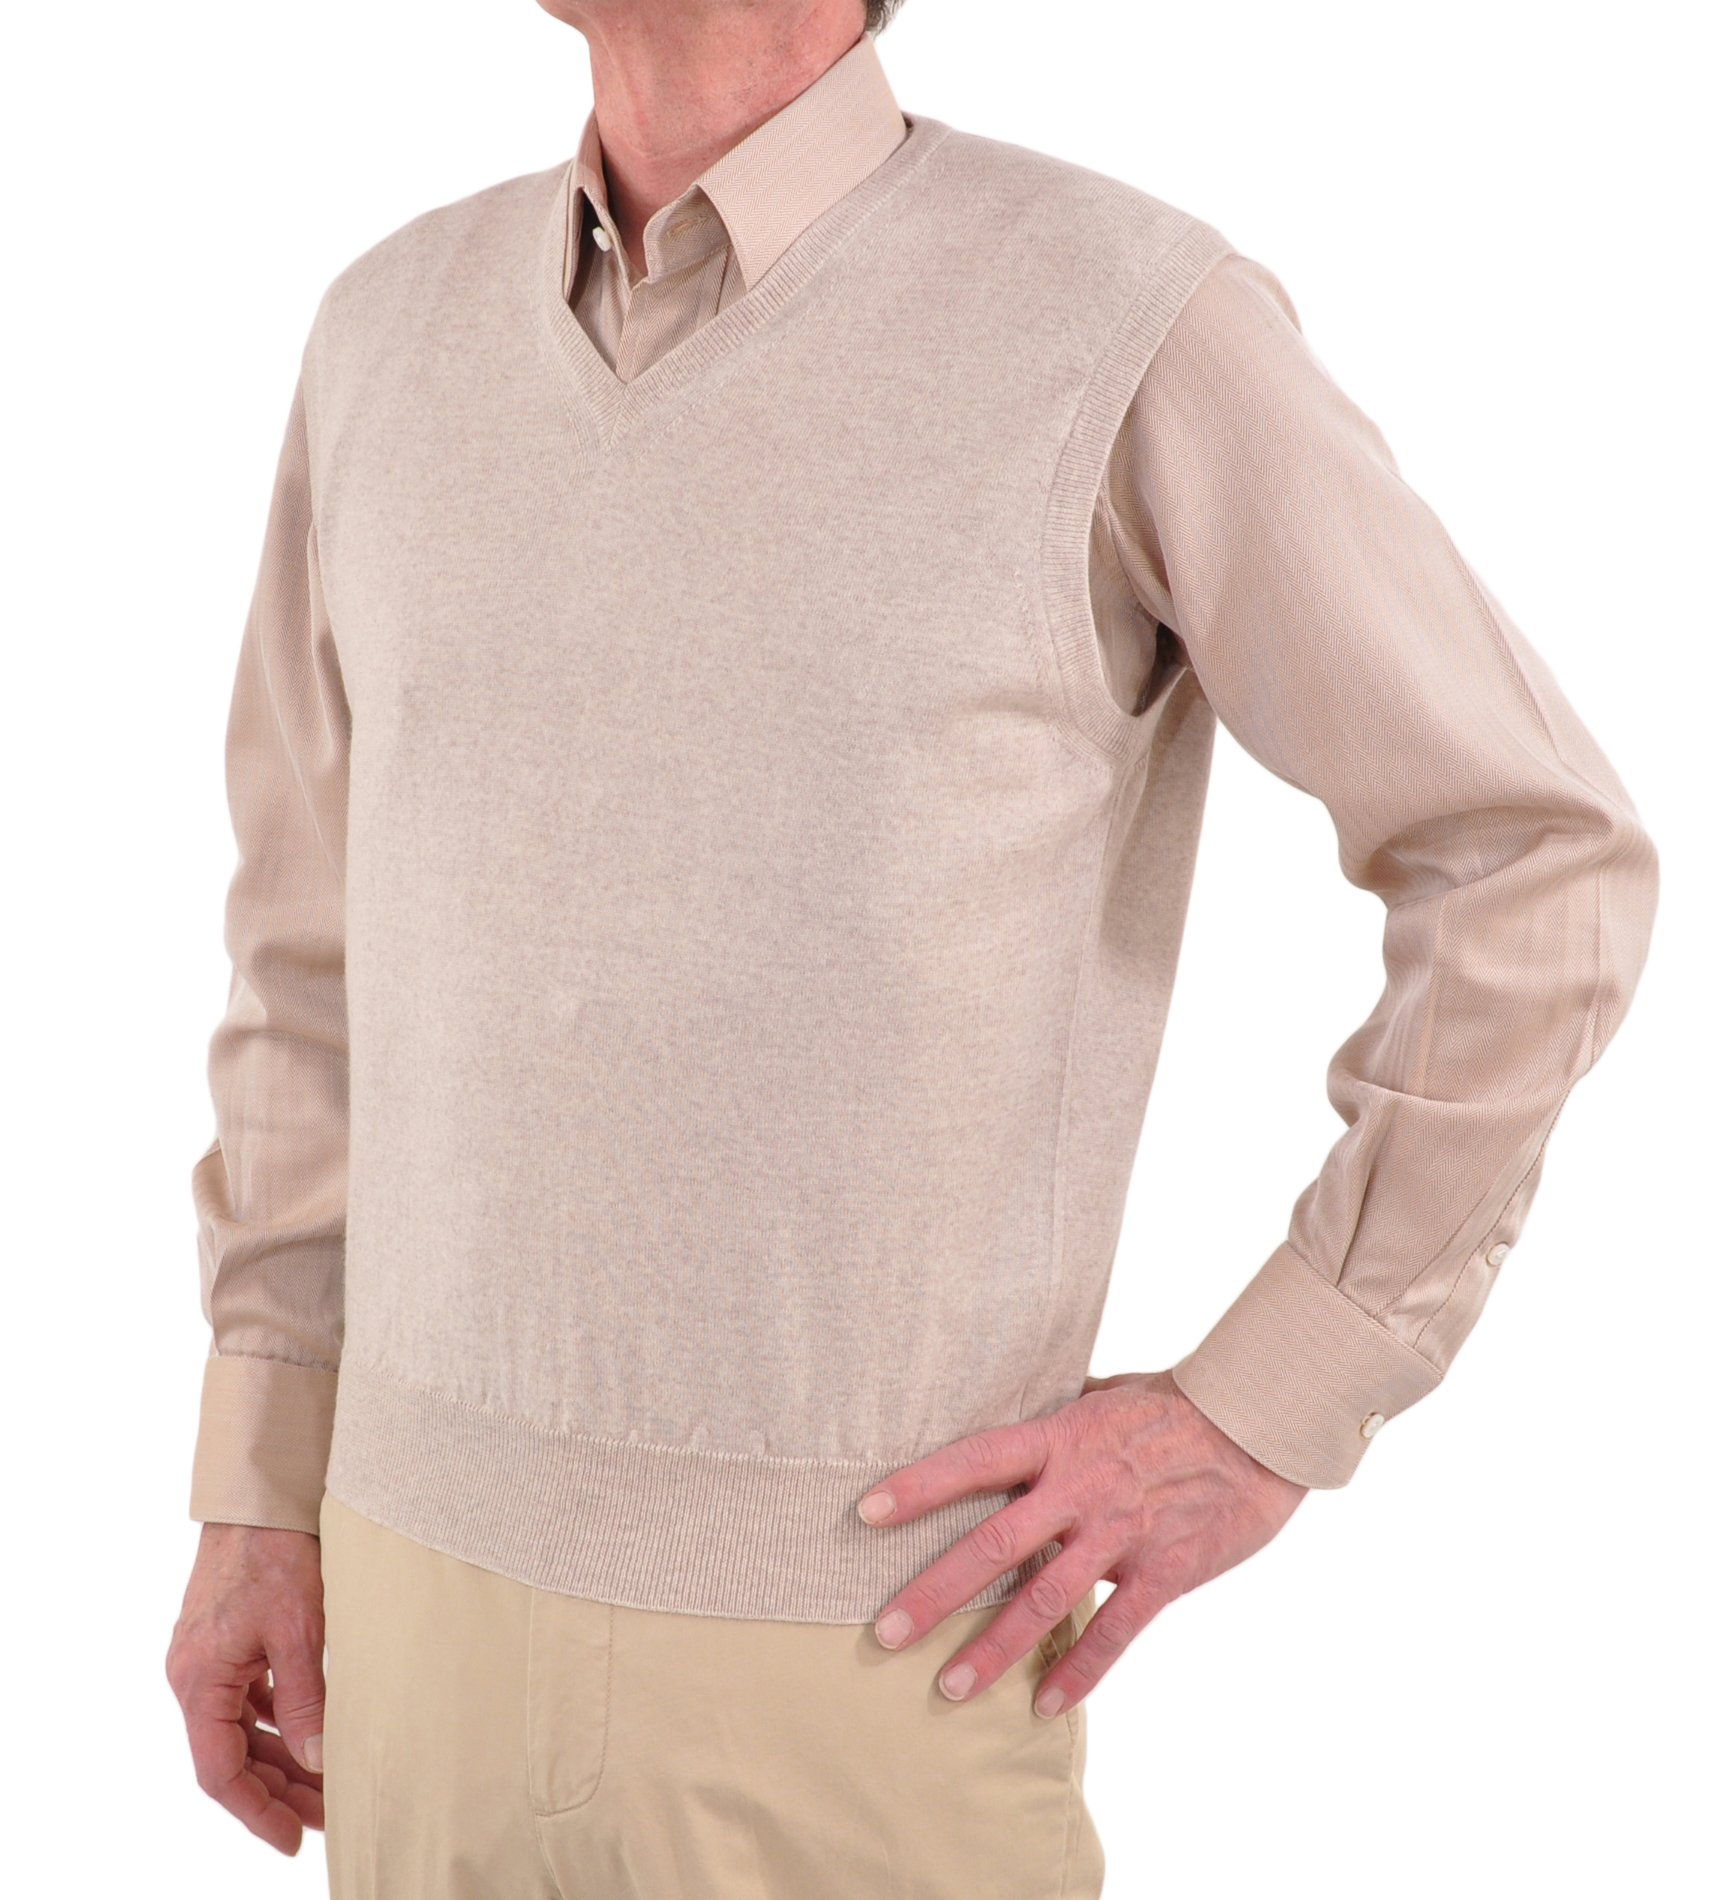 Gran Sasso Extrafine Merino Wool Sleeveless V-Neck Sweater 2XLarge/Natural